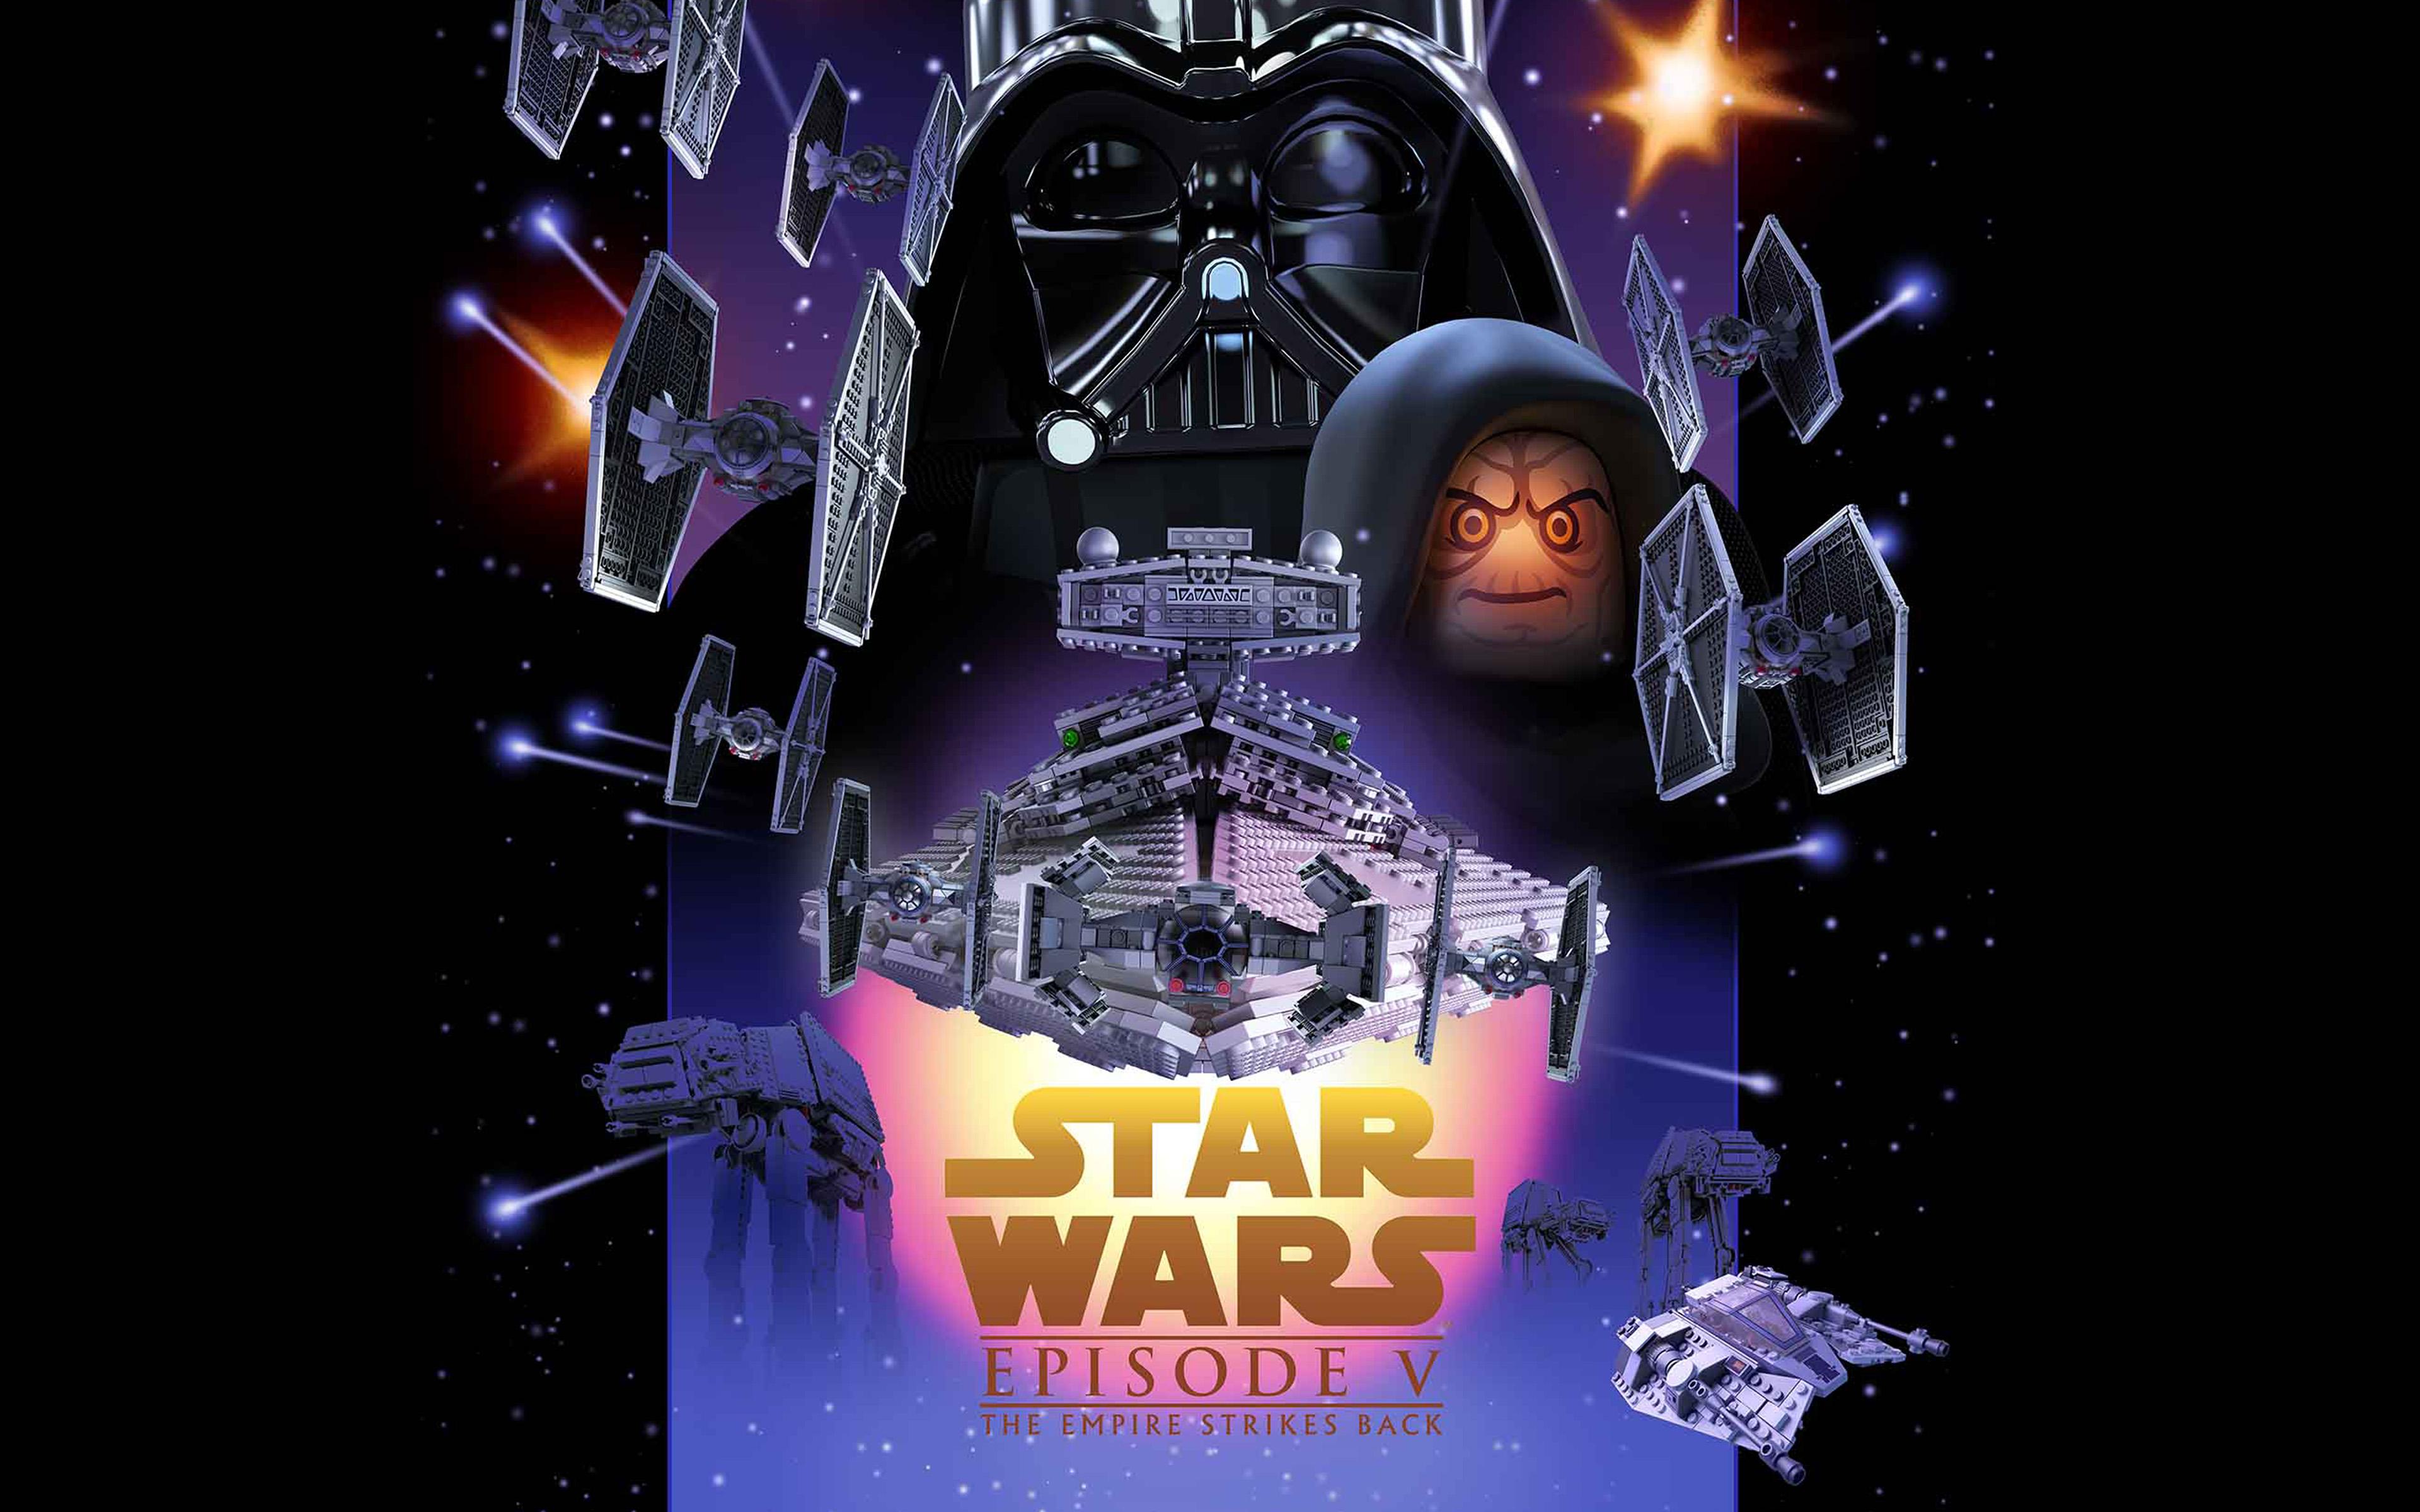 Star Wars Wallpaper 4k Mac Get Images